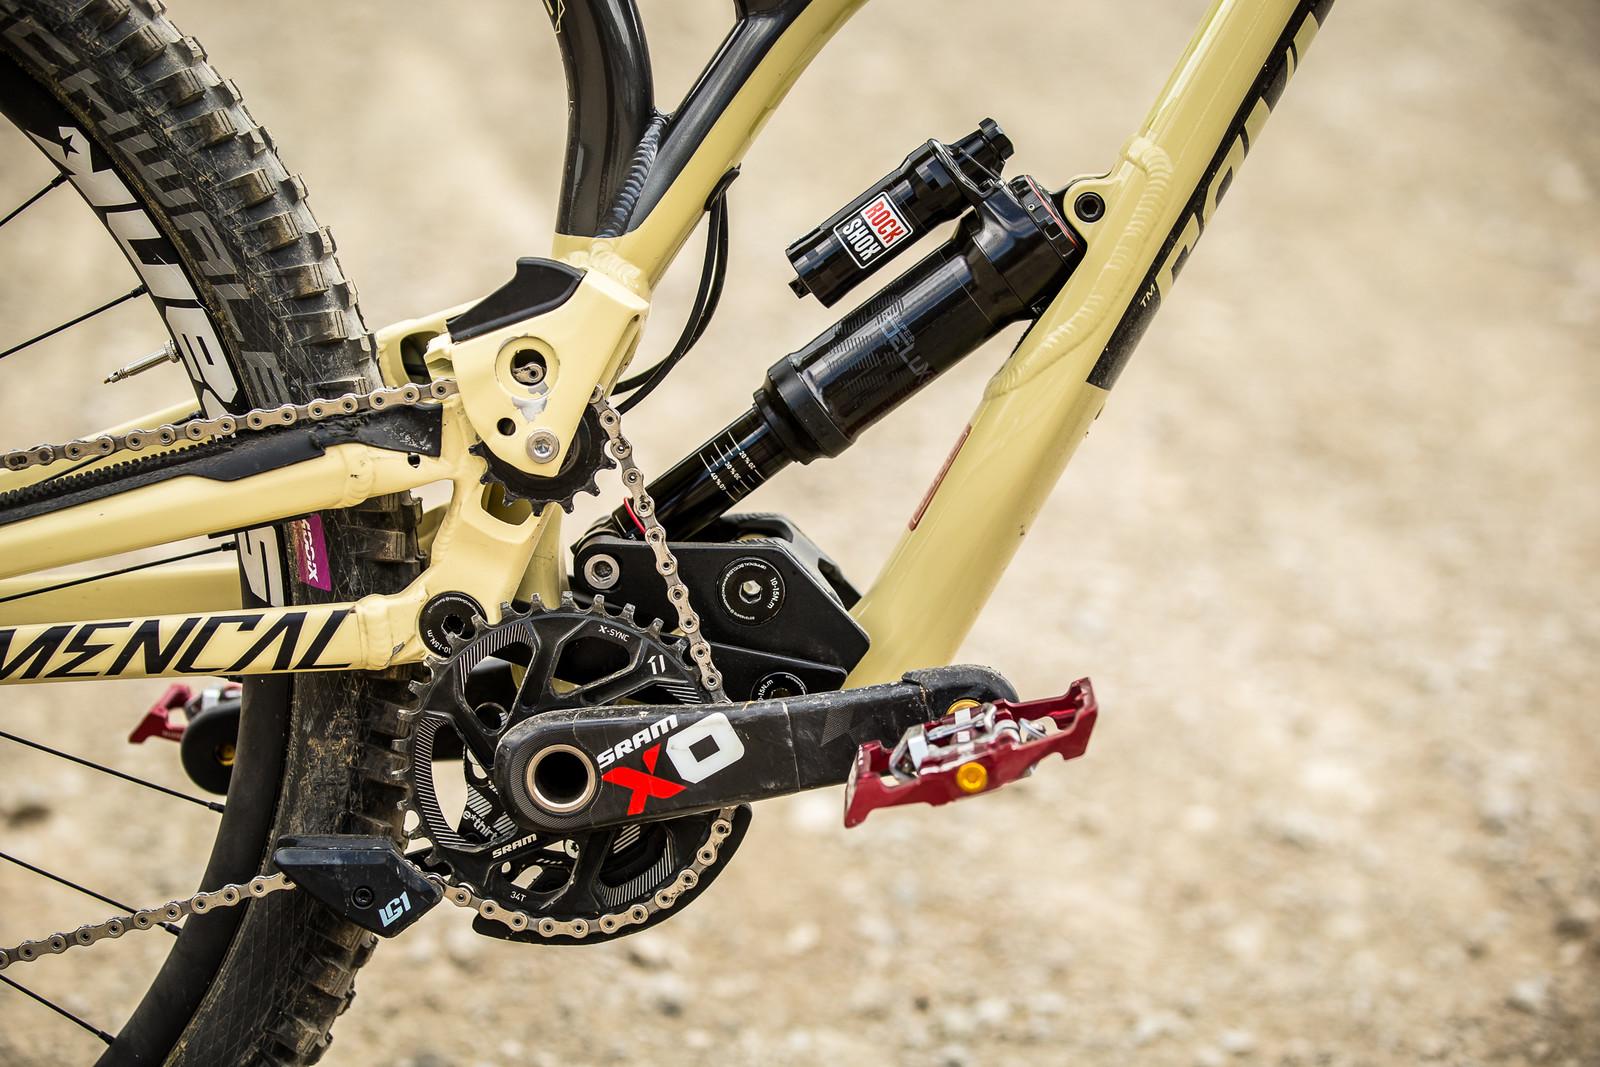 High-Pivot FTW - WINNING BIKE - Amaury Pierron's Commencal Supreme DH 29 - Mountain Biking Pictures - Vital MTB